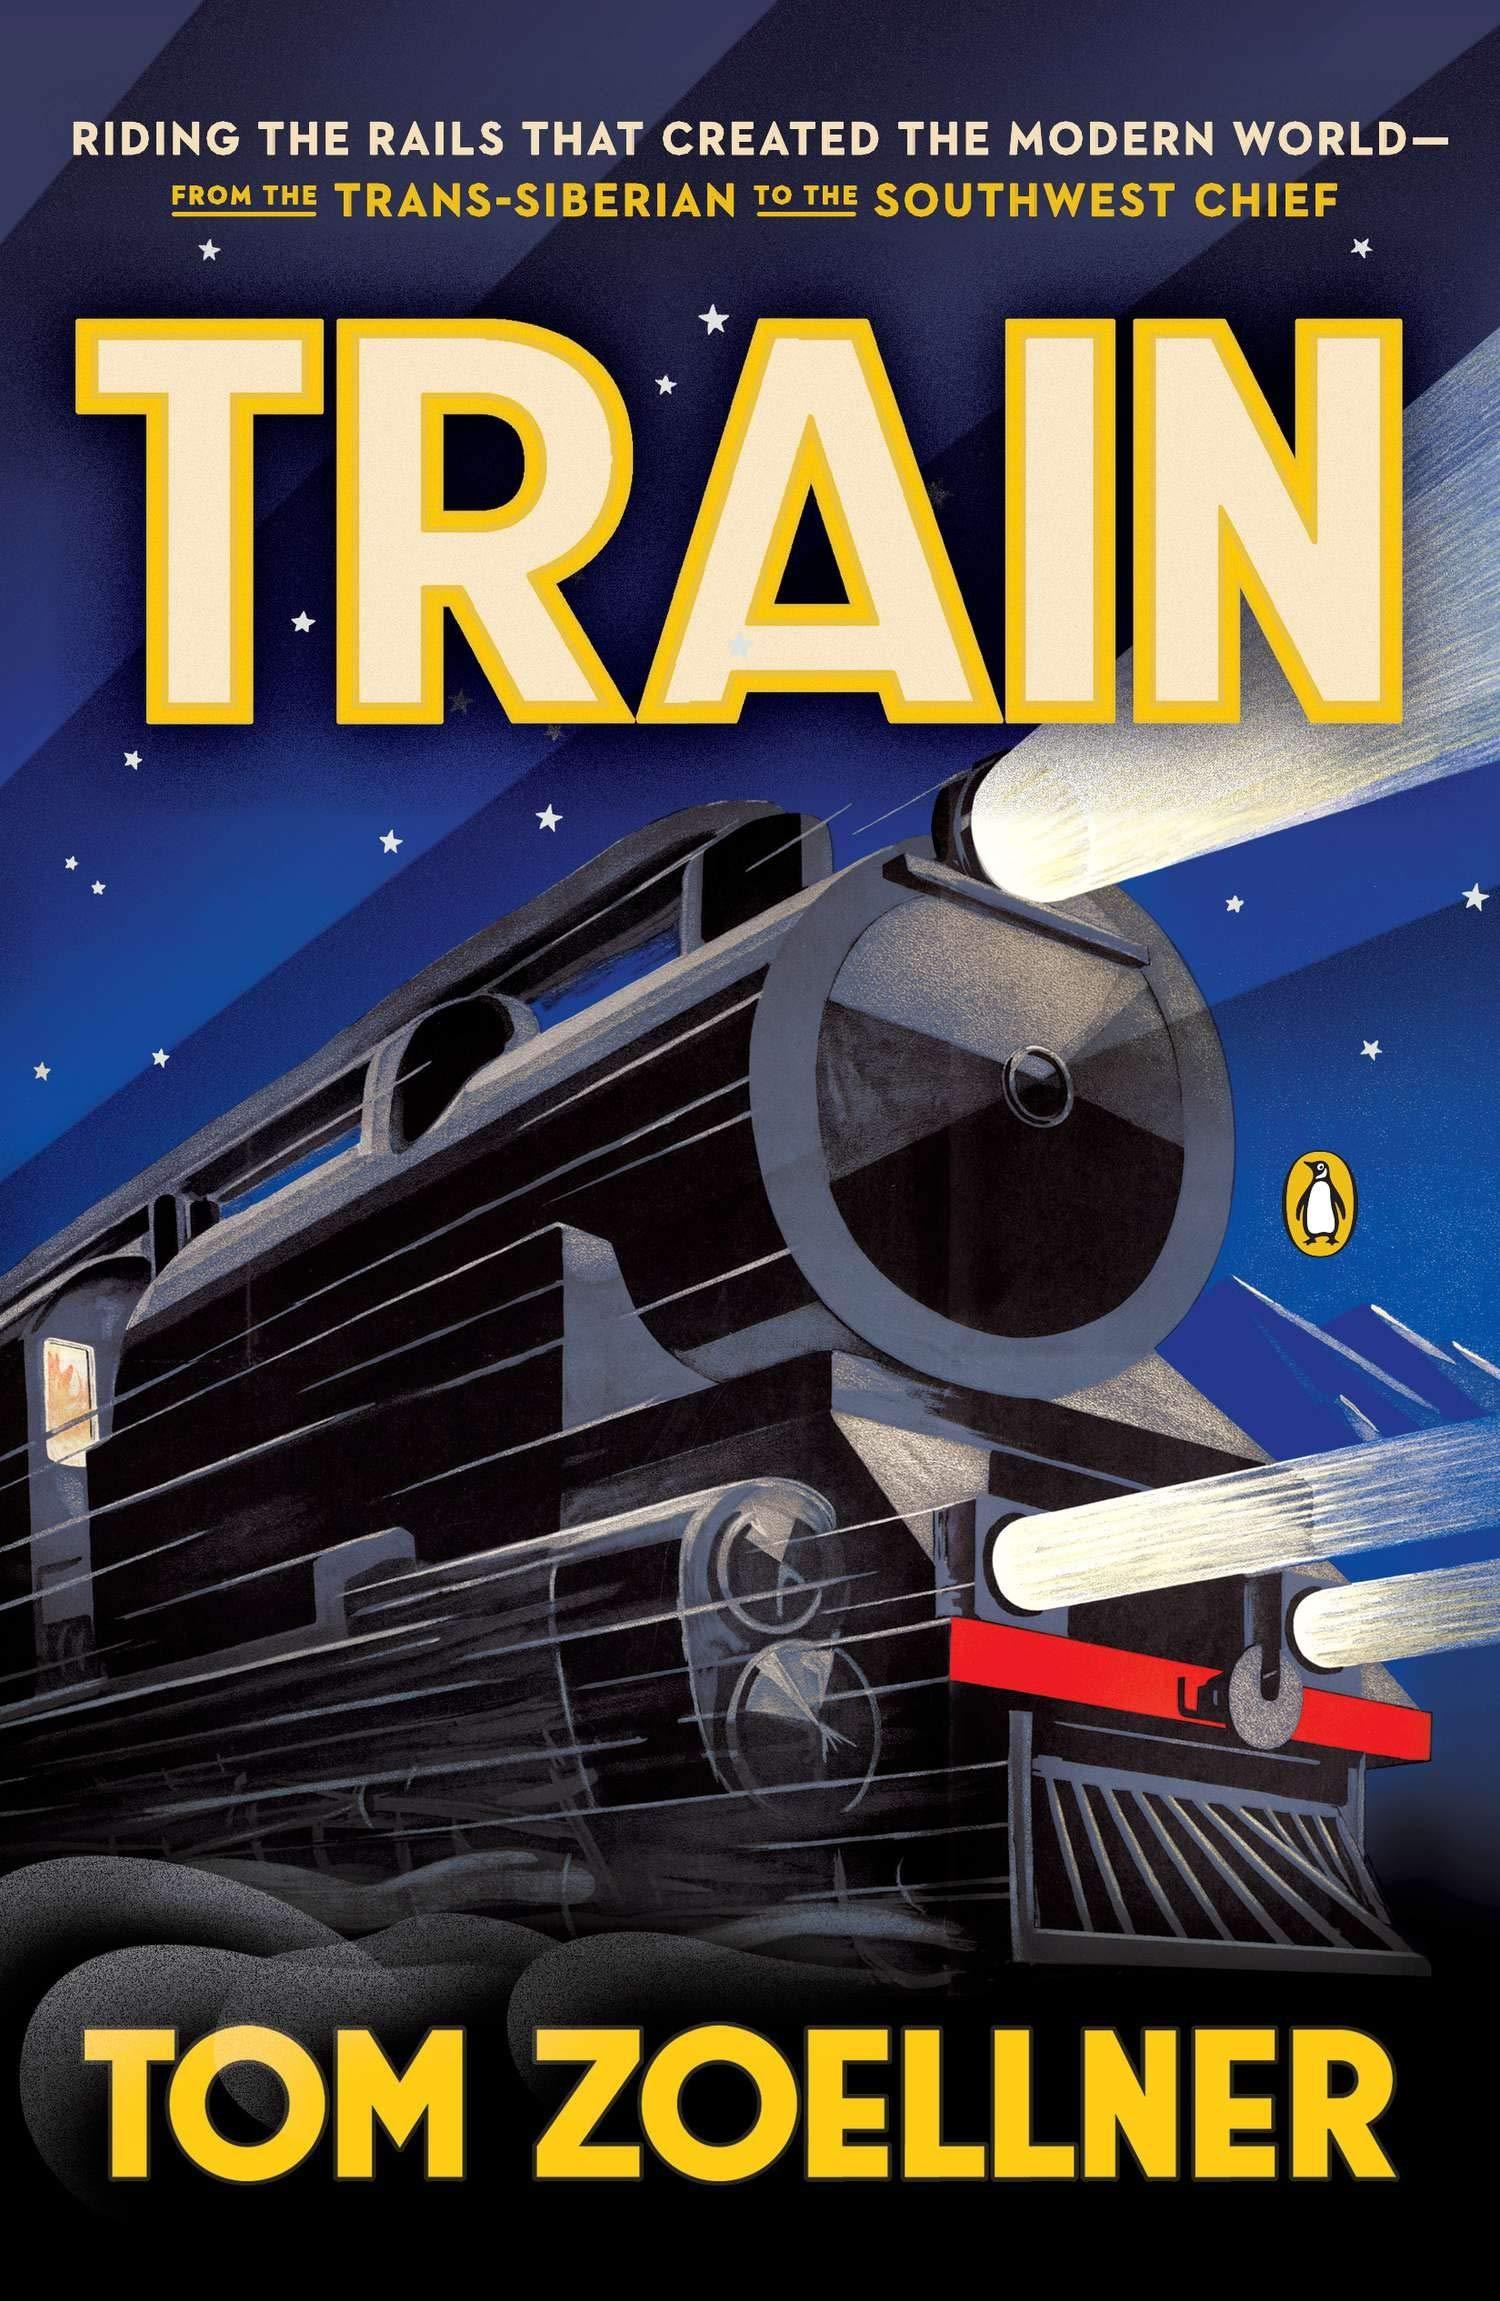 HIGHLAND RAIL PIN BADGE NEW BR TRAINS SCOTRAIL BRITISH RAIL CLASS 37 47